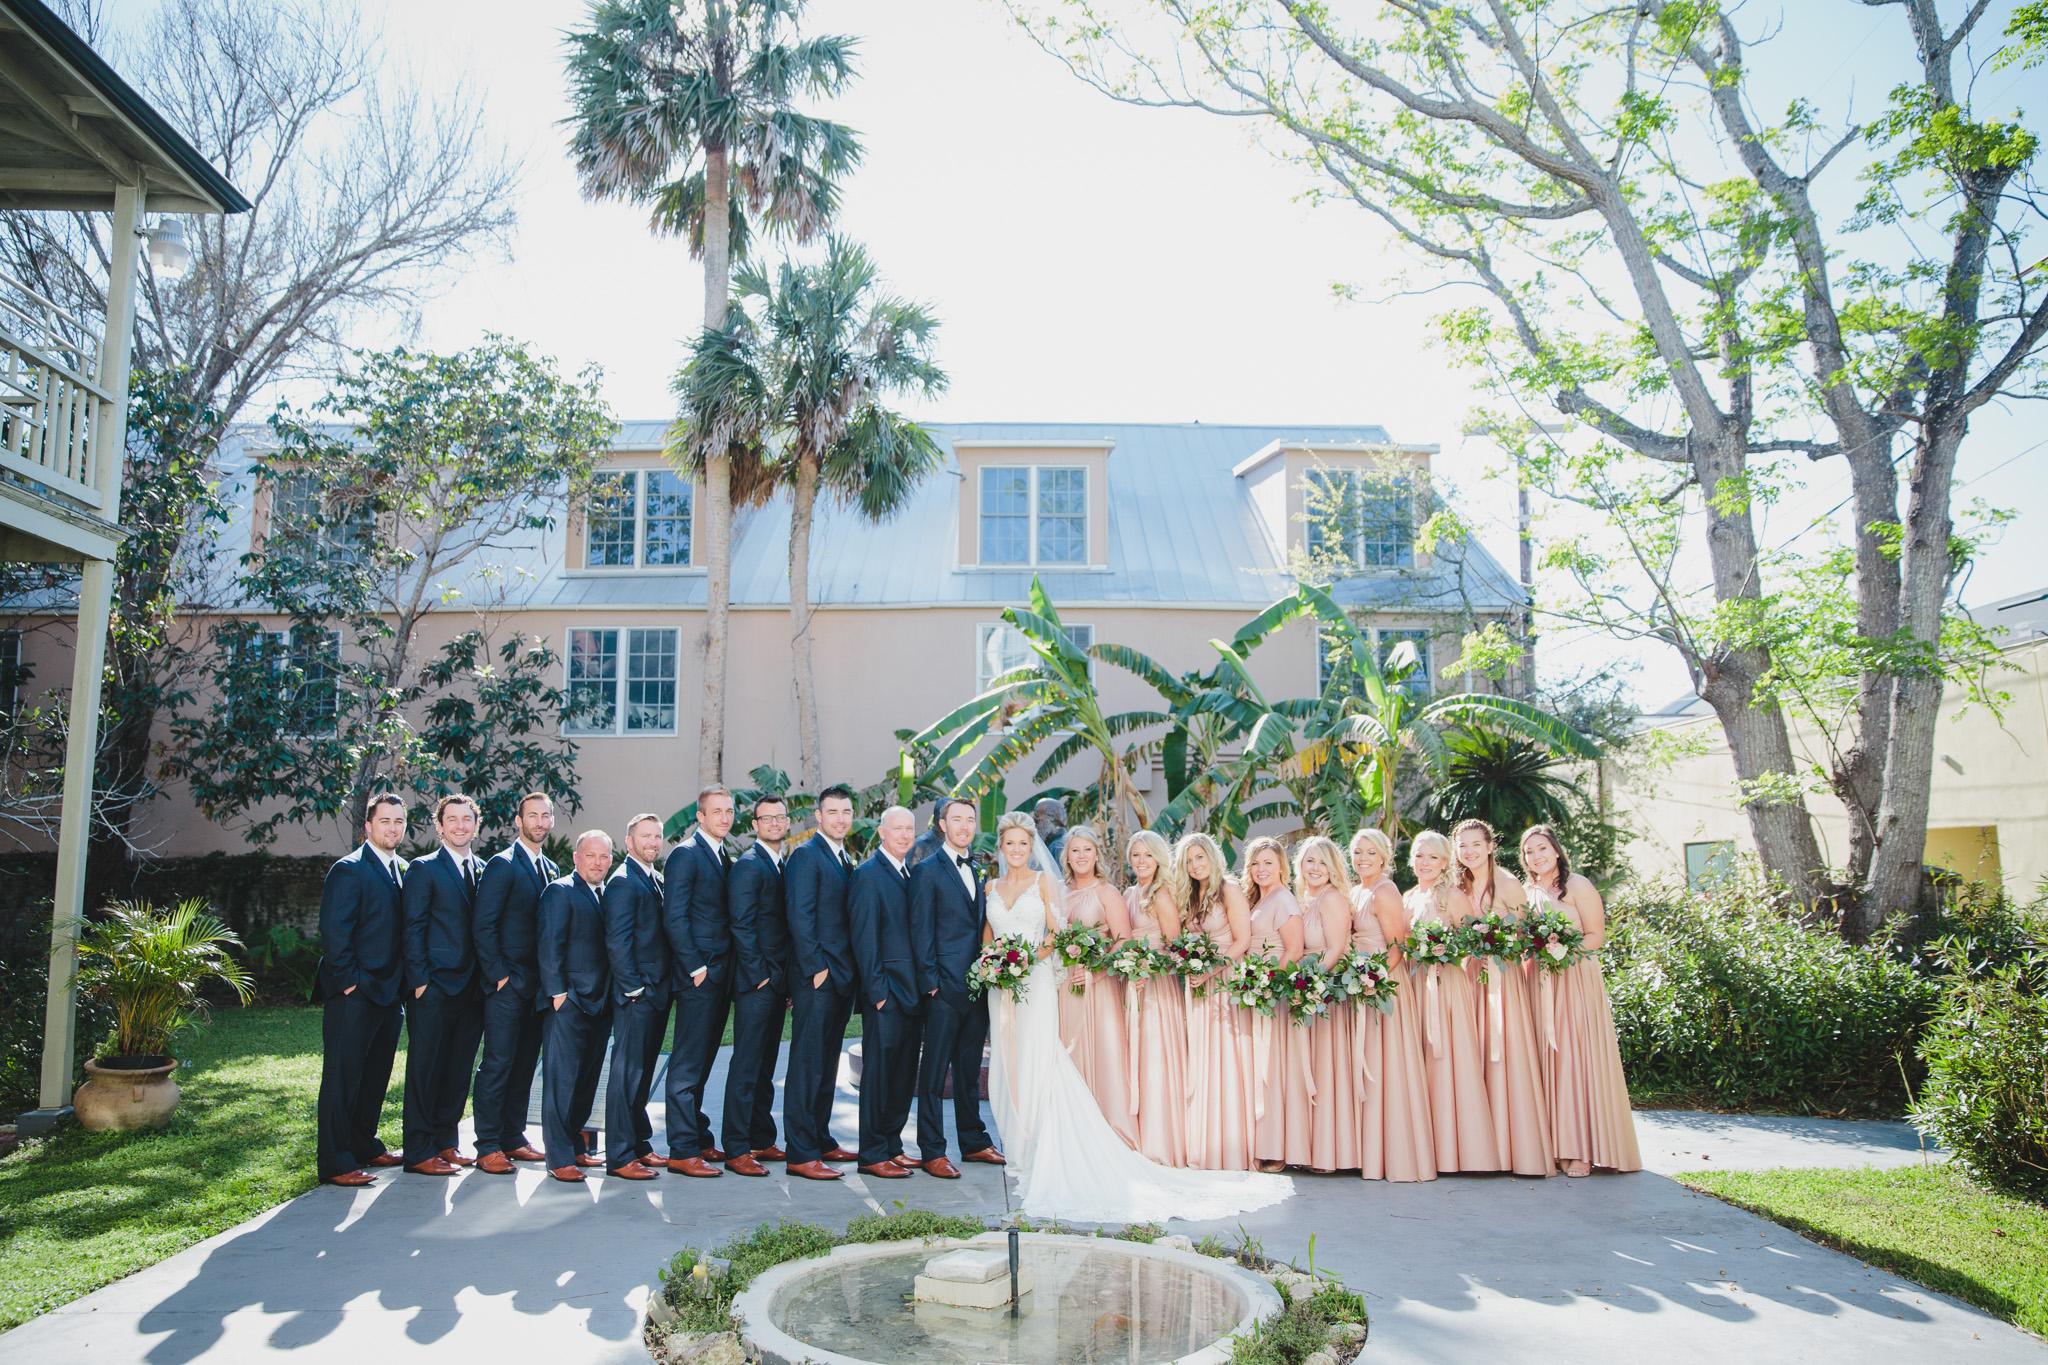 st-augustine-florida-wedding-venue-white-room-bridal-party